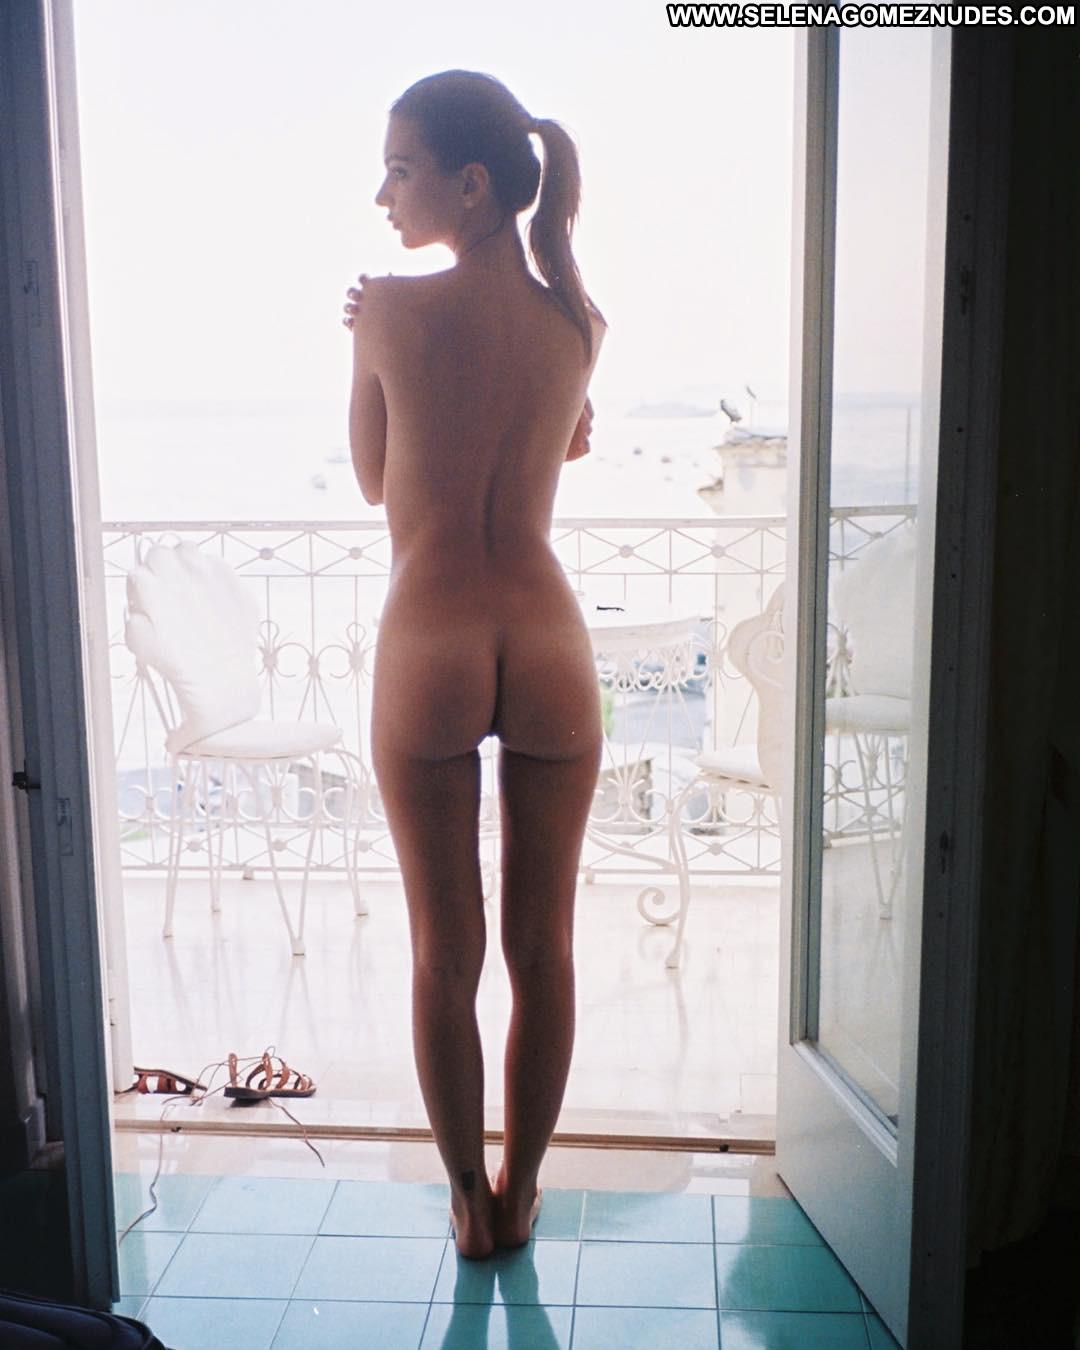 XXX Vienna Kendall nude (57 foto and video), Sexy, Bikini, Selfie, bra 2015